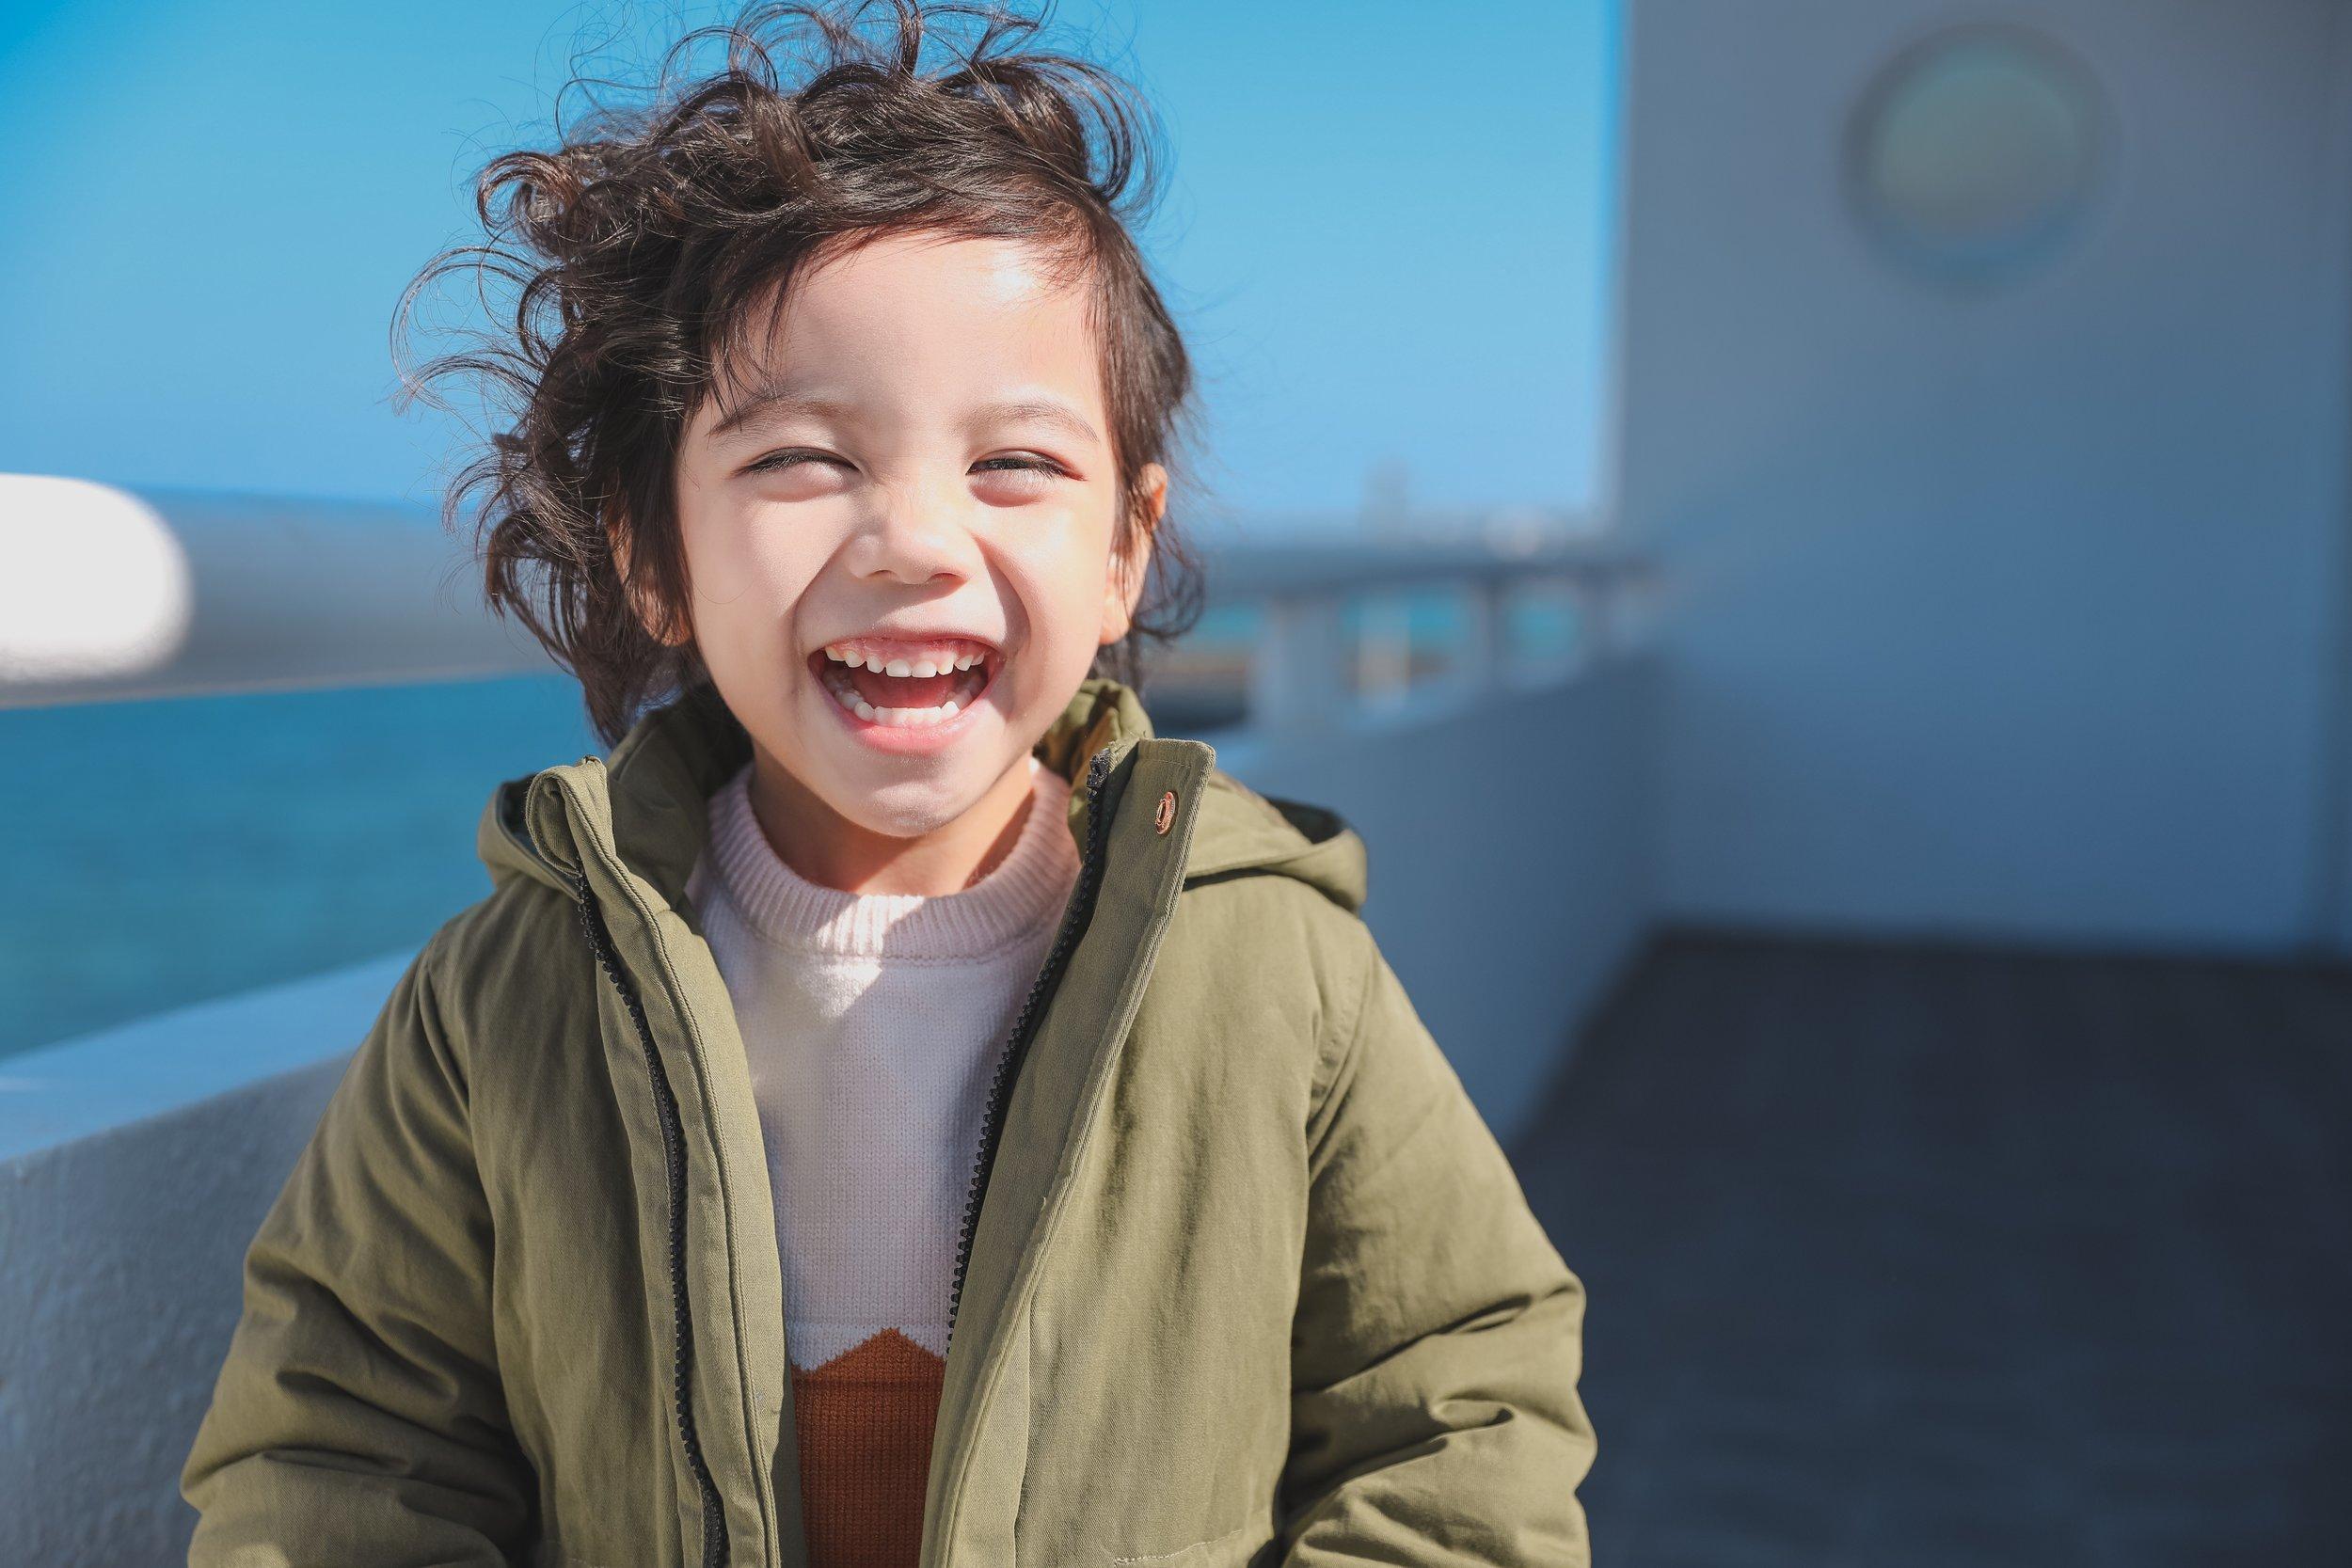 adorable-boy-child-1688253 (1).jpg